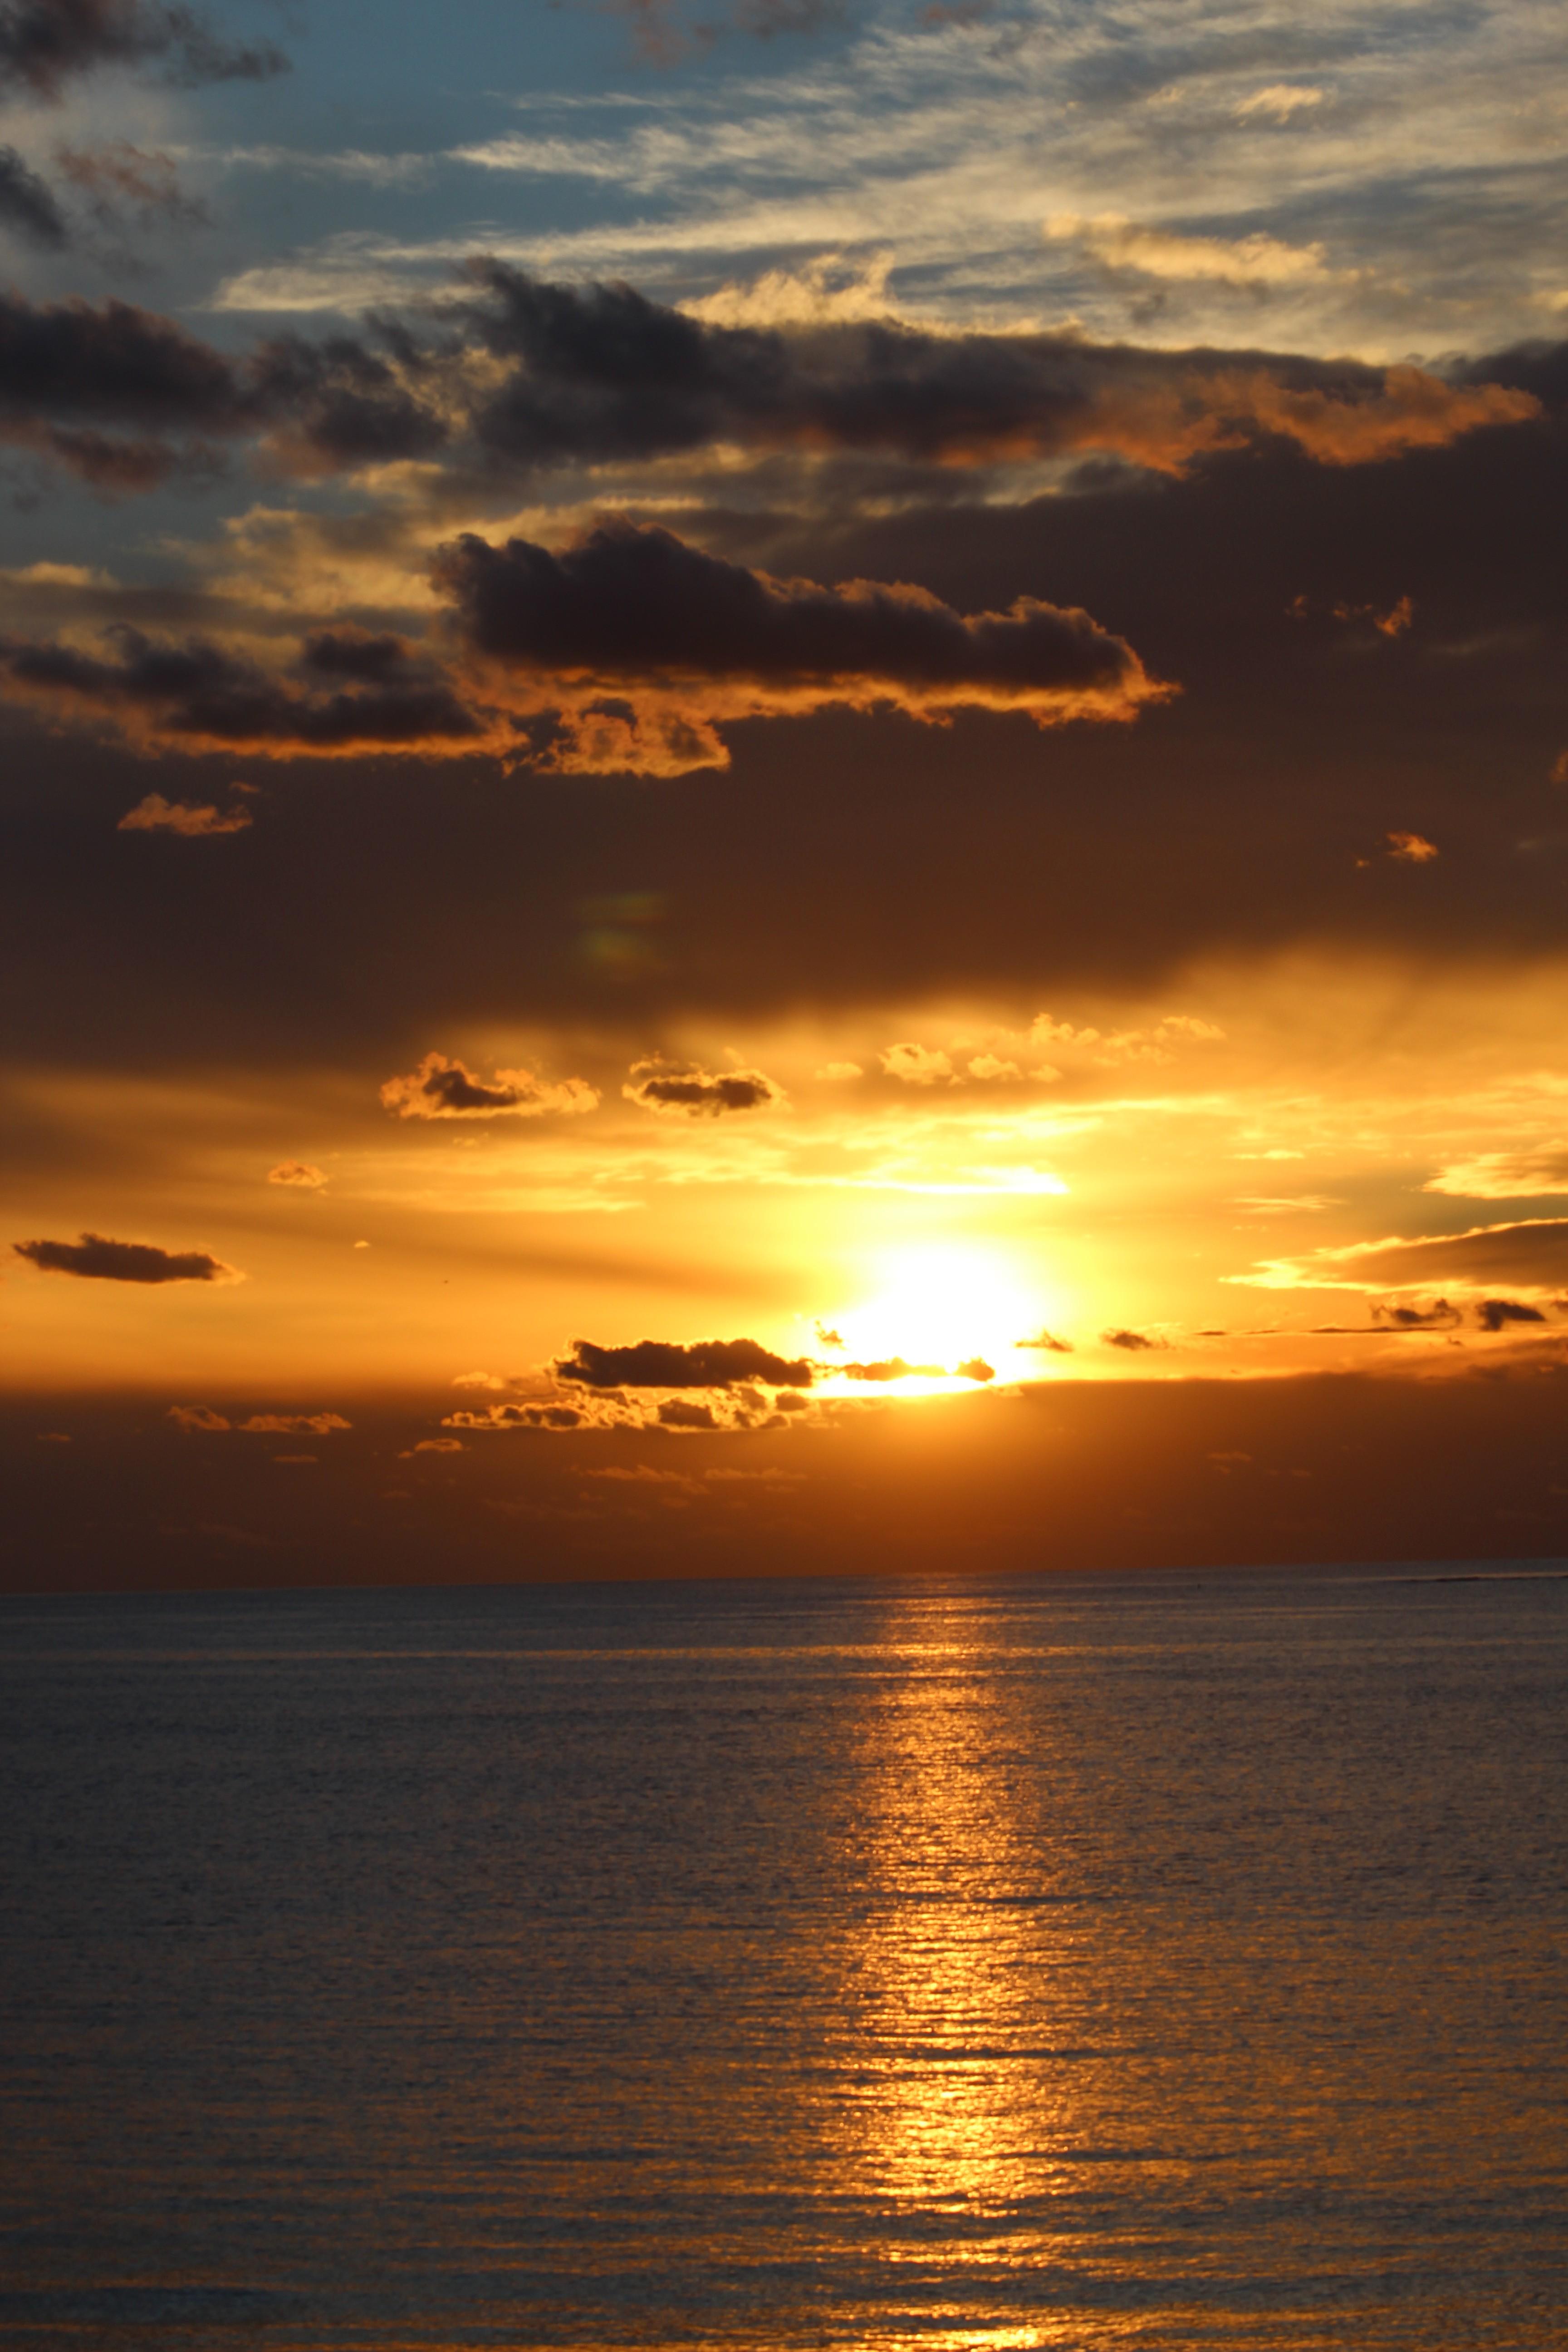 General 3456x5184 sunlight sea sunset water Australia nature